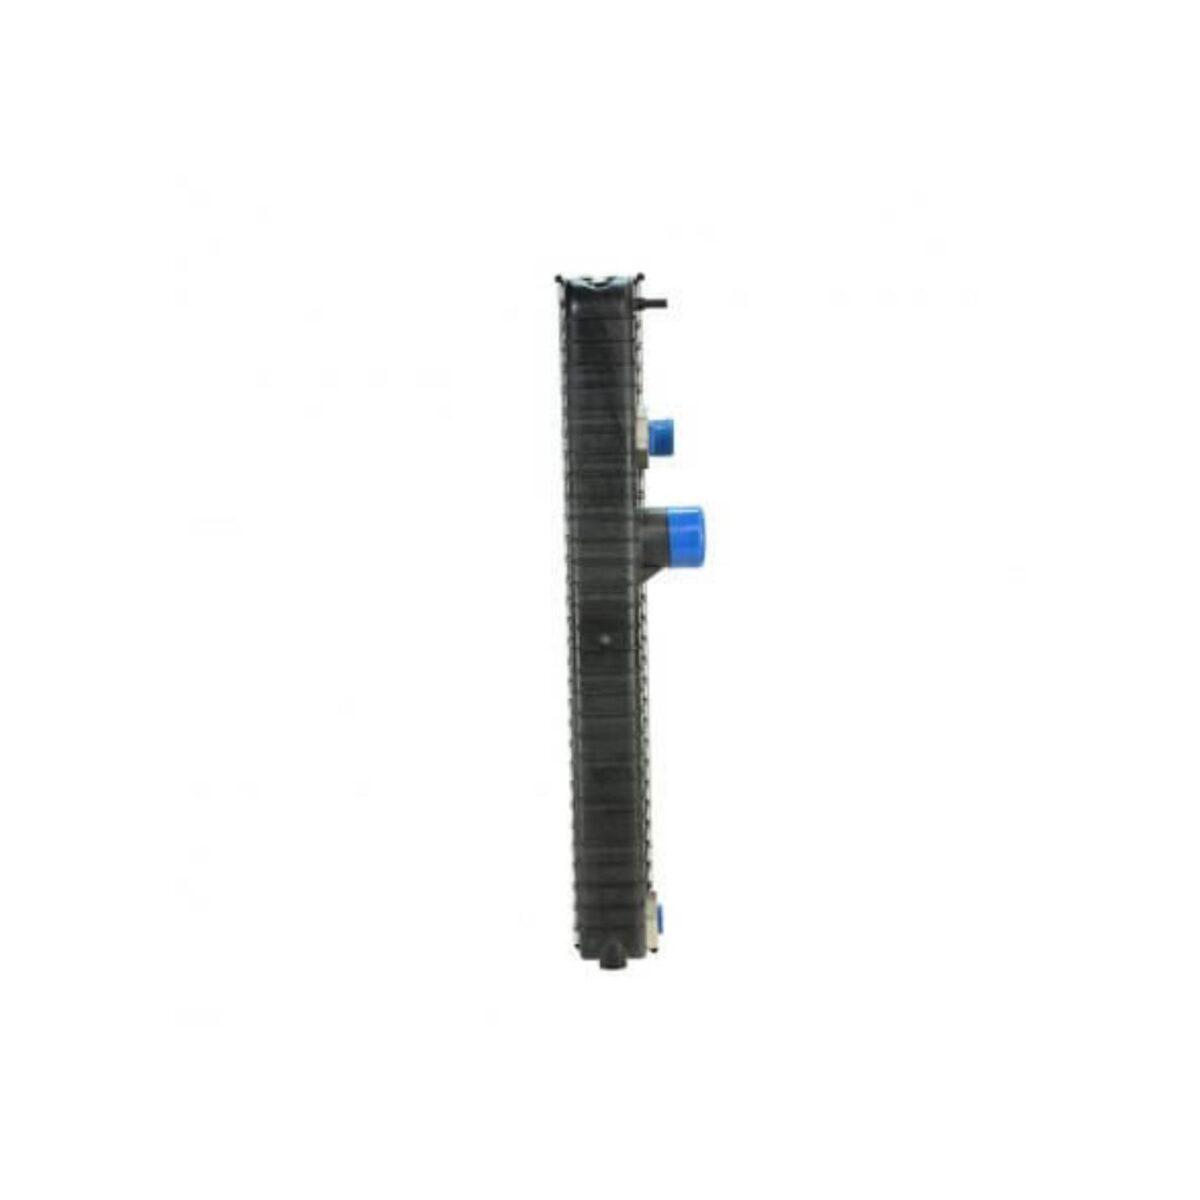 international durastar 4300 series 12 13 radiator oem 2602926c92 5